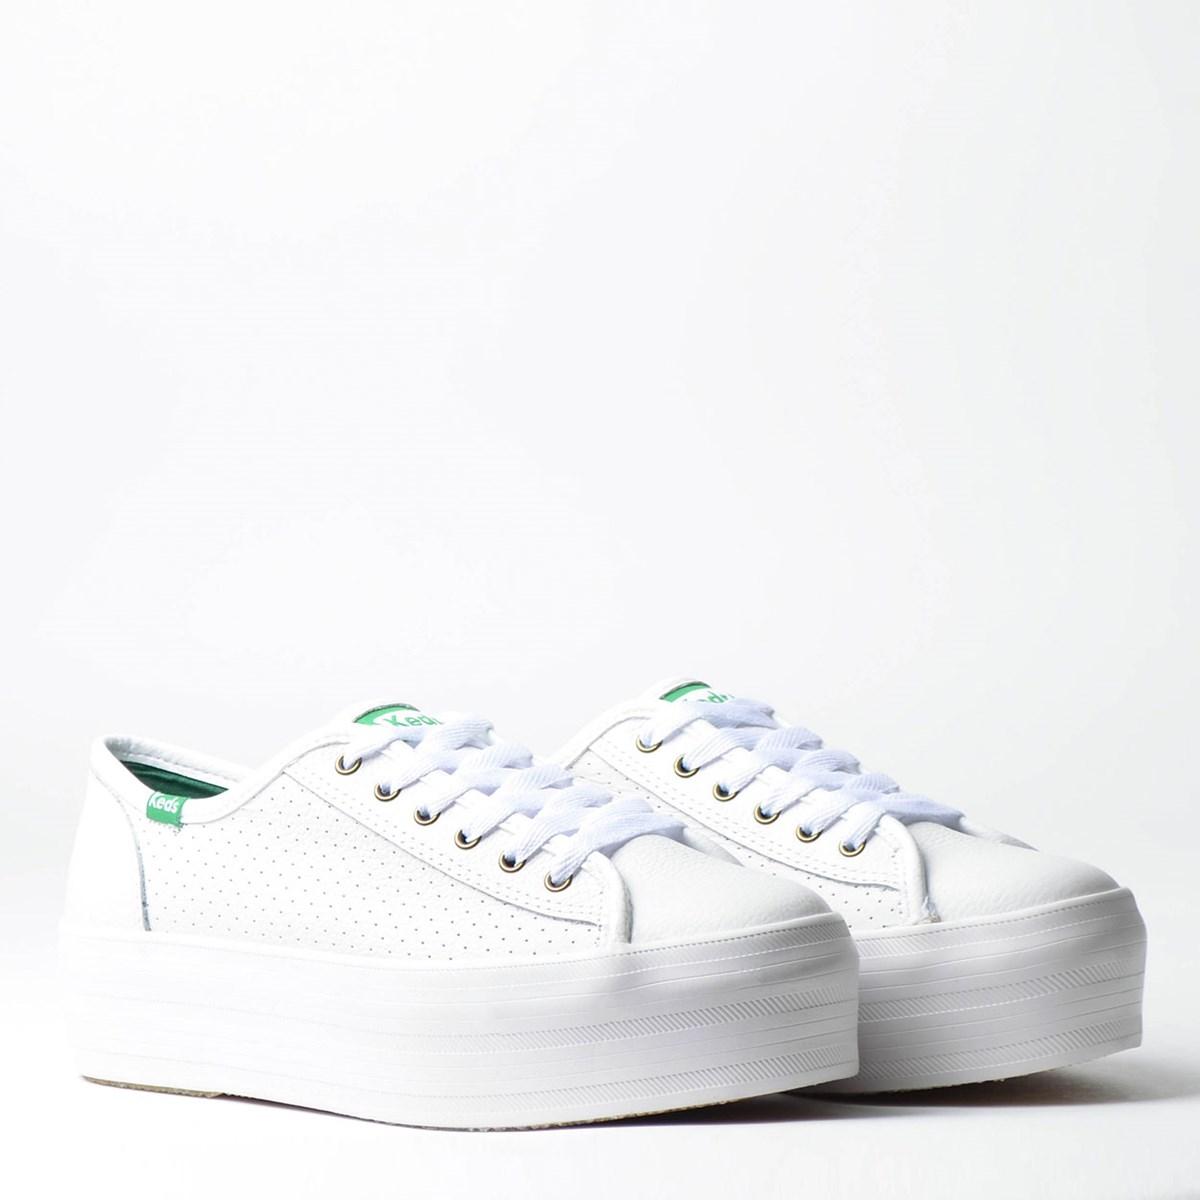 Tênis Keds Plataform Kick Perf Leather Branco Verde KD1402232